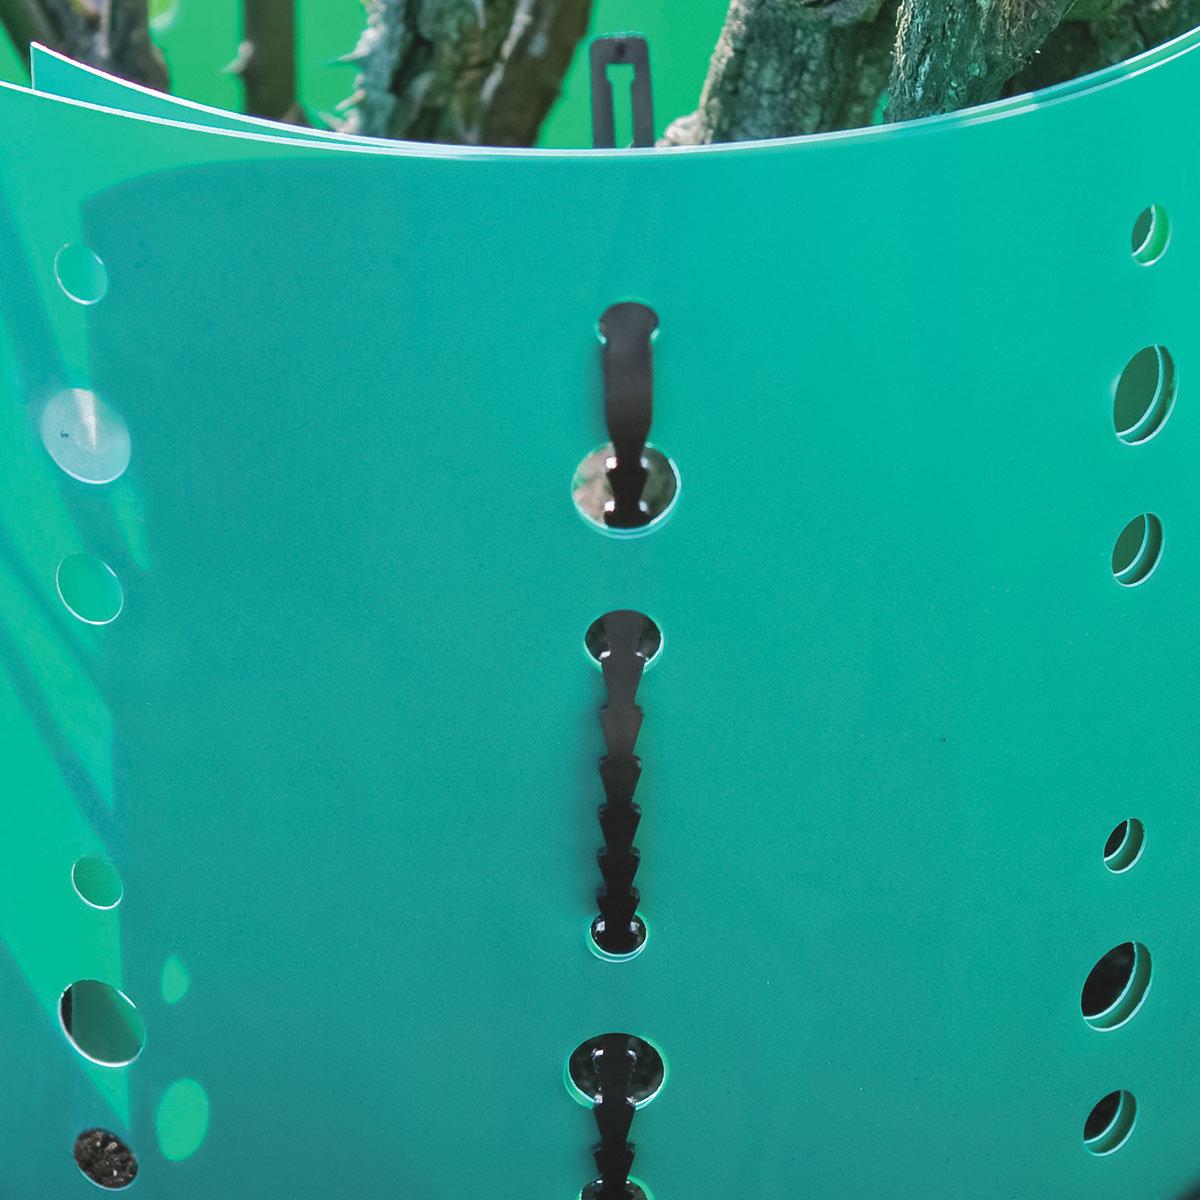 Rosen-Manschette, 2er-Set, 90x16 cm, Kunststoff, grün | #2